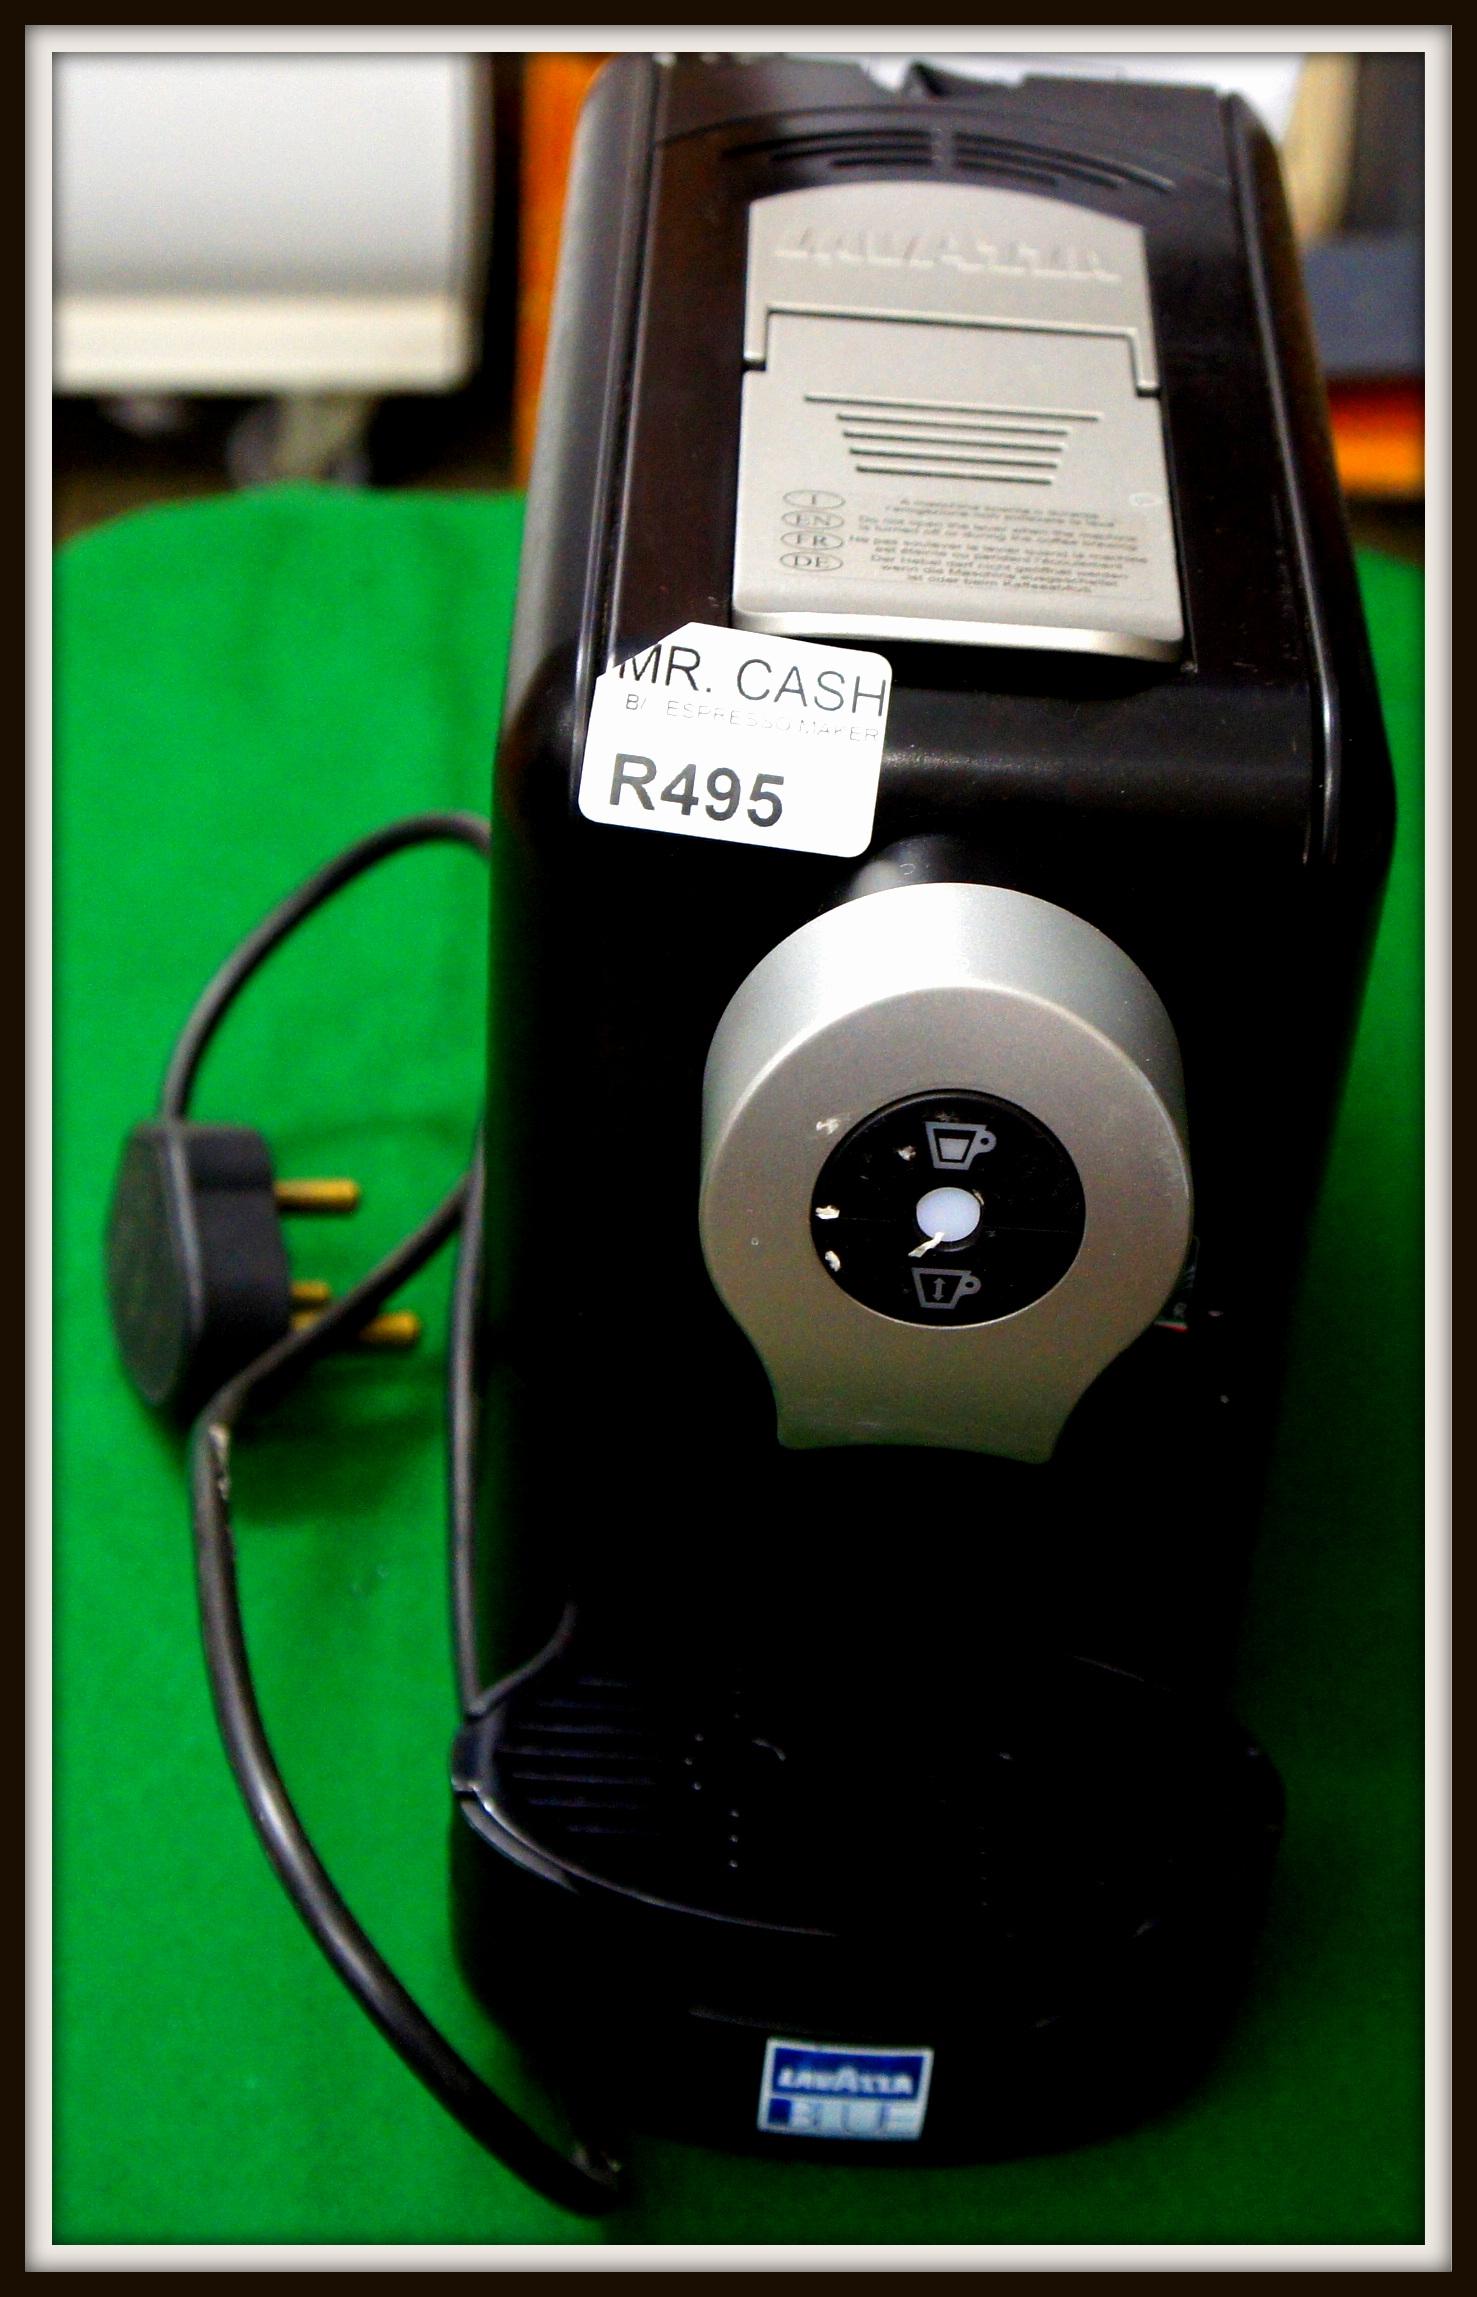 espresso maker R495